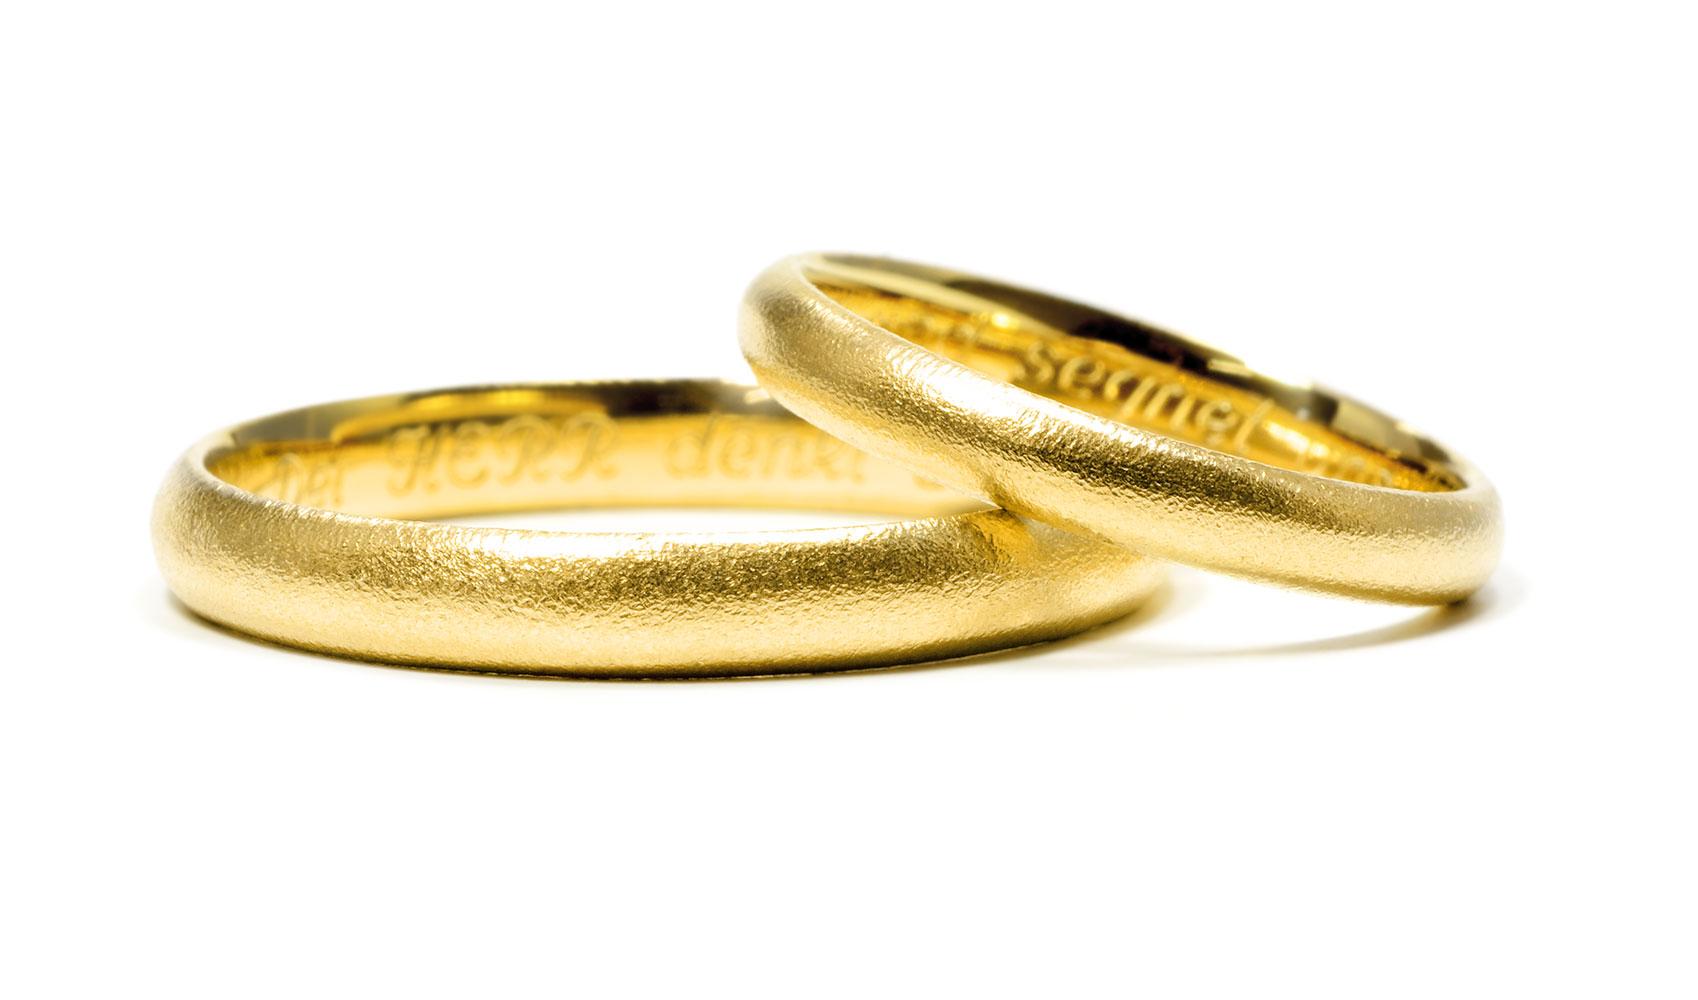 GOLDAFFAIRS - zarte Trauringe aus Fair Trade Gold, sandmatt